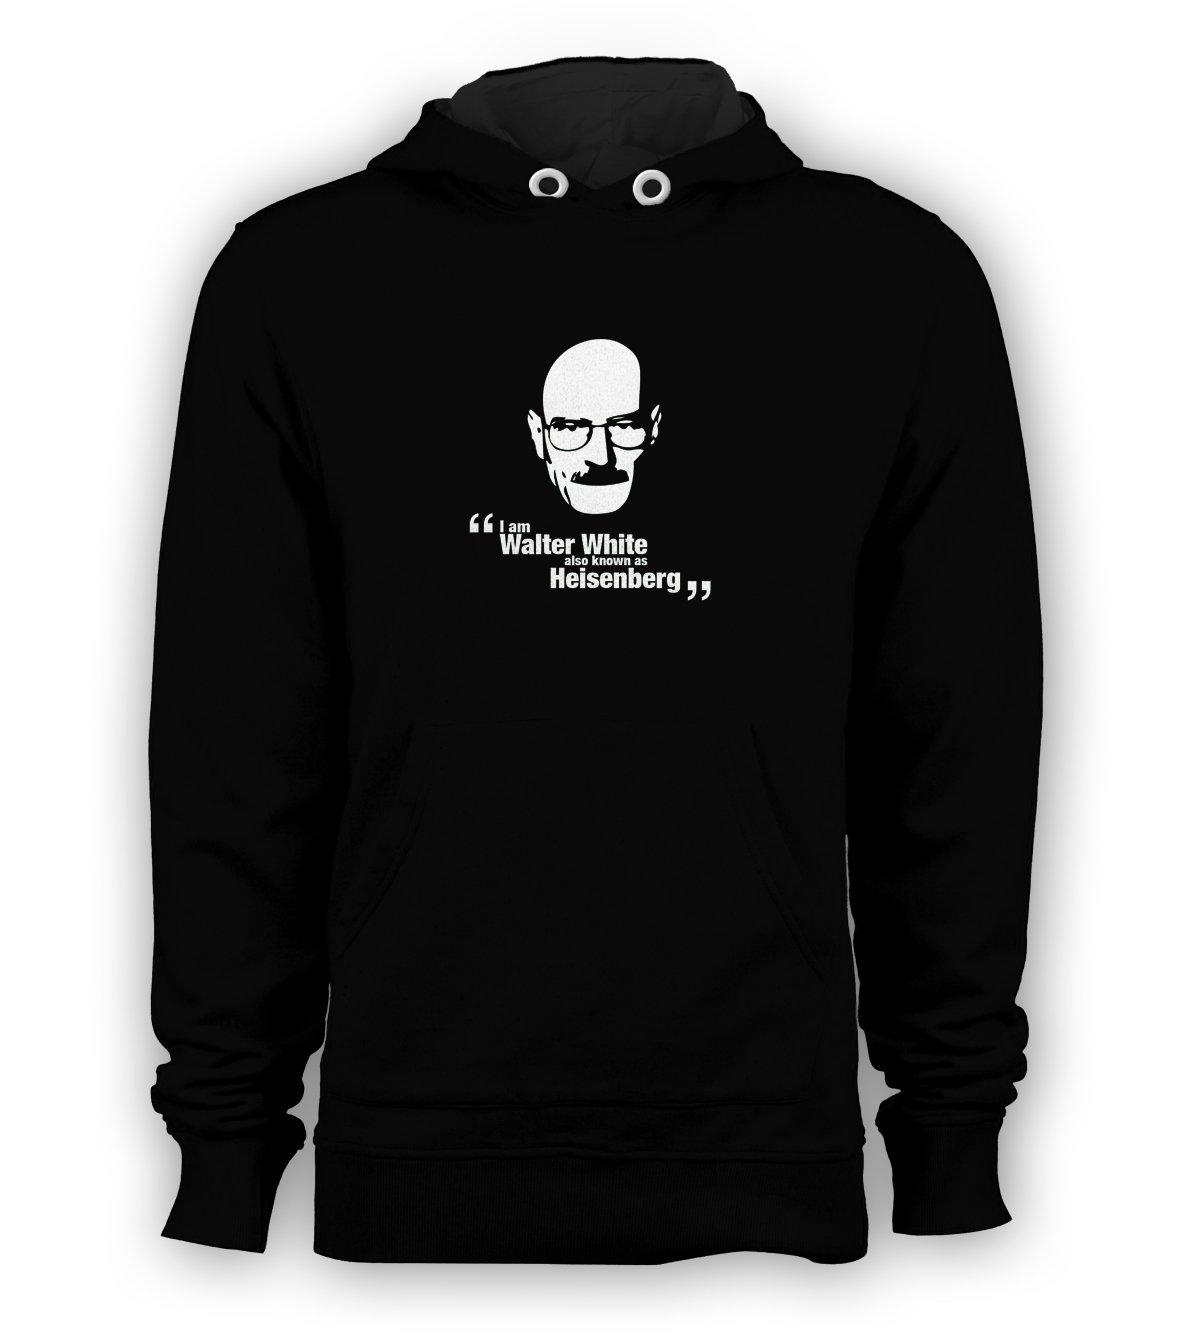 Heisenberg Walter White Pullover Hoodie Men Sweatshirts Size S to 3XL New Black